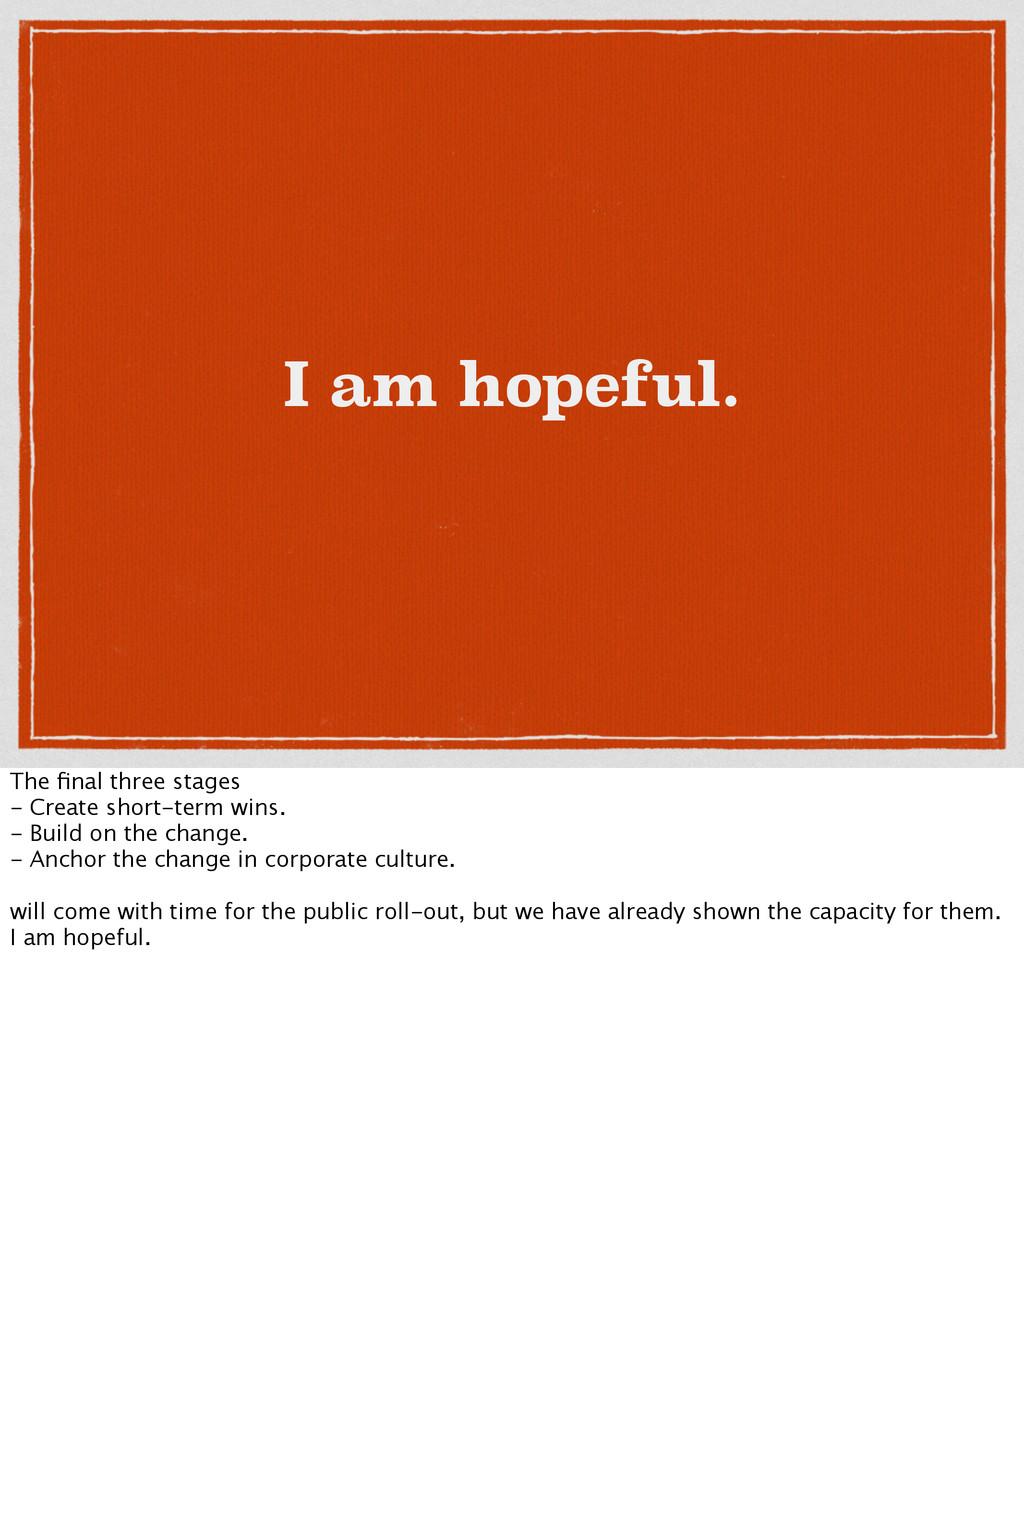 I am hopeful. The final three stages - Create sh...